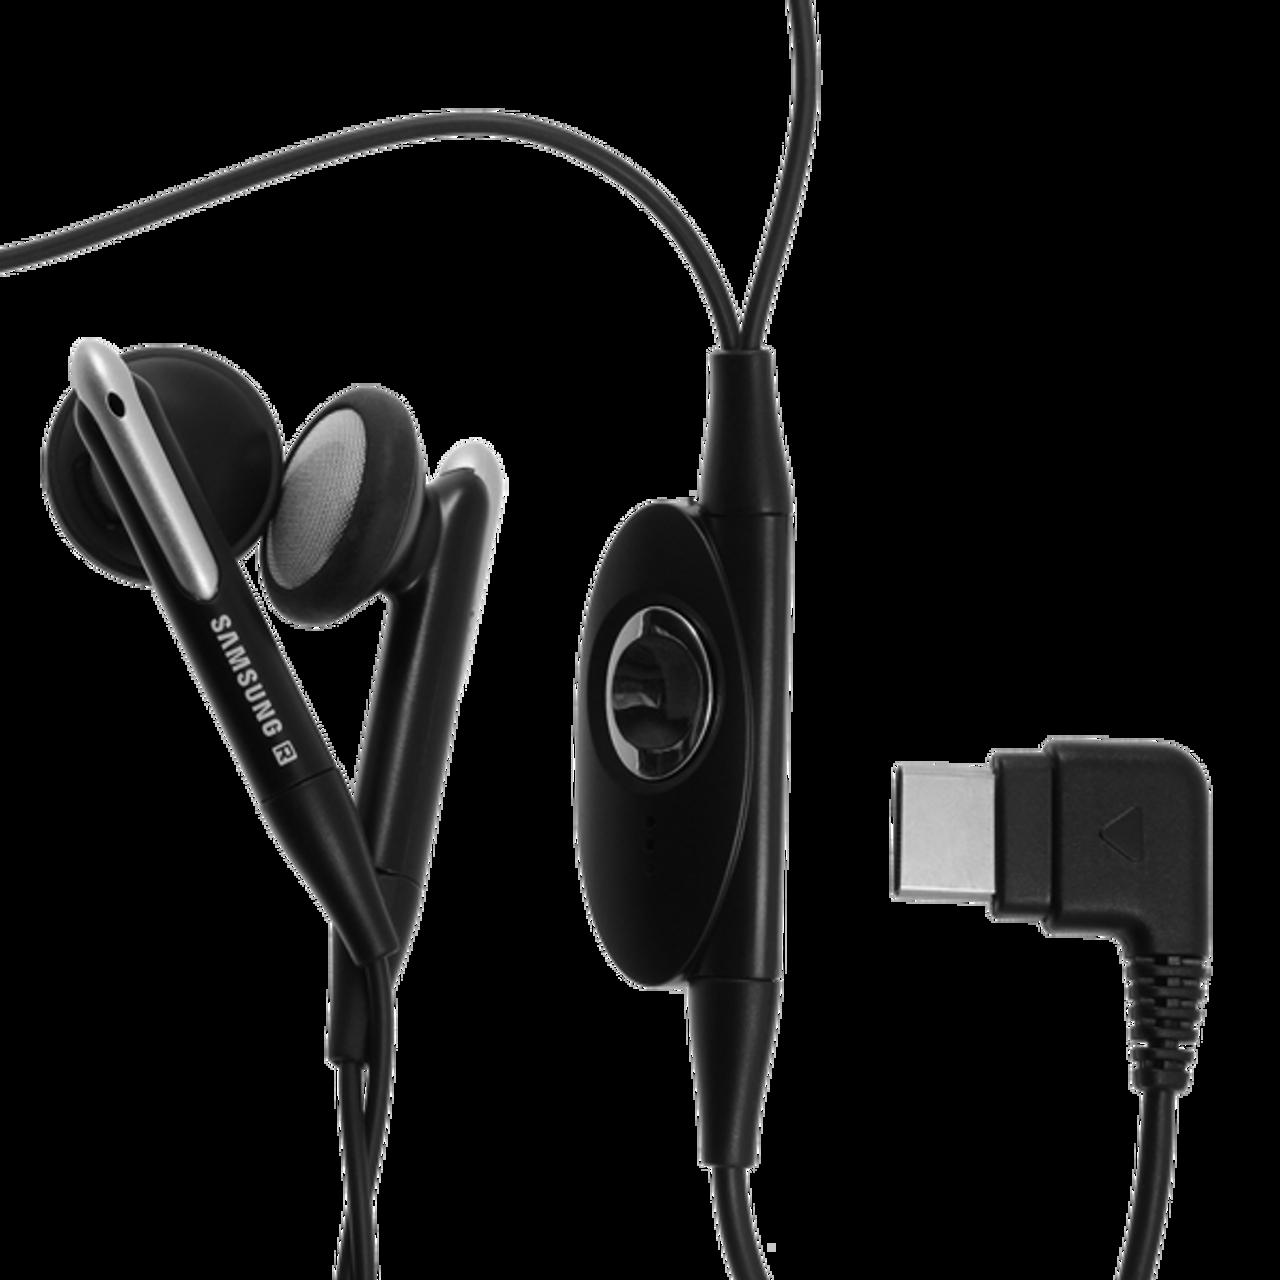 Samsung Aep420sbe Hands Free Stereo Headset Esurebuy Com